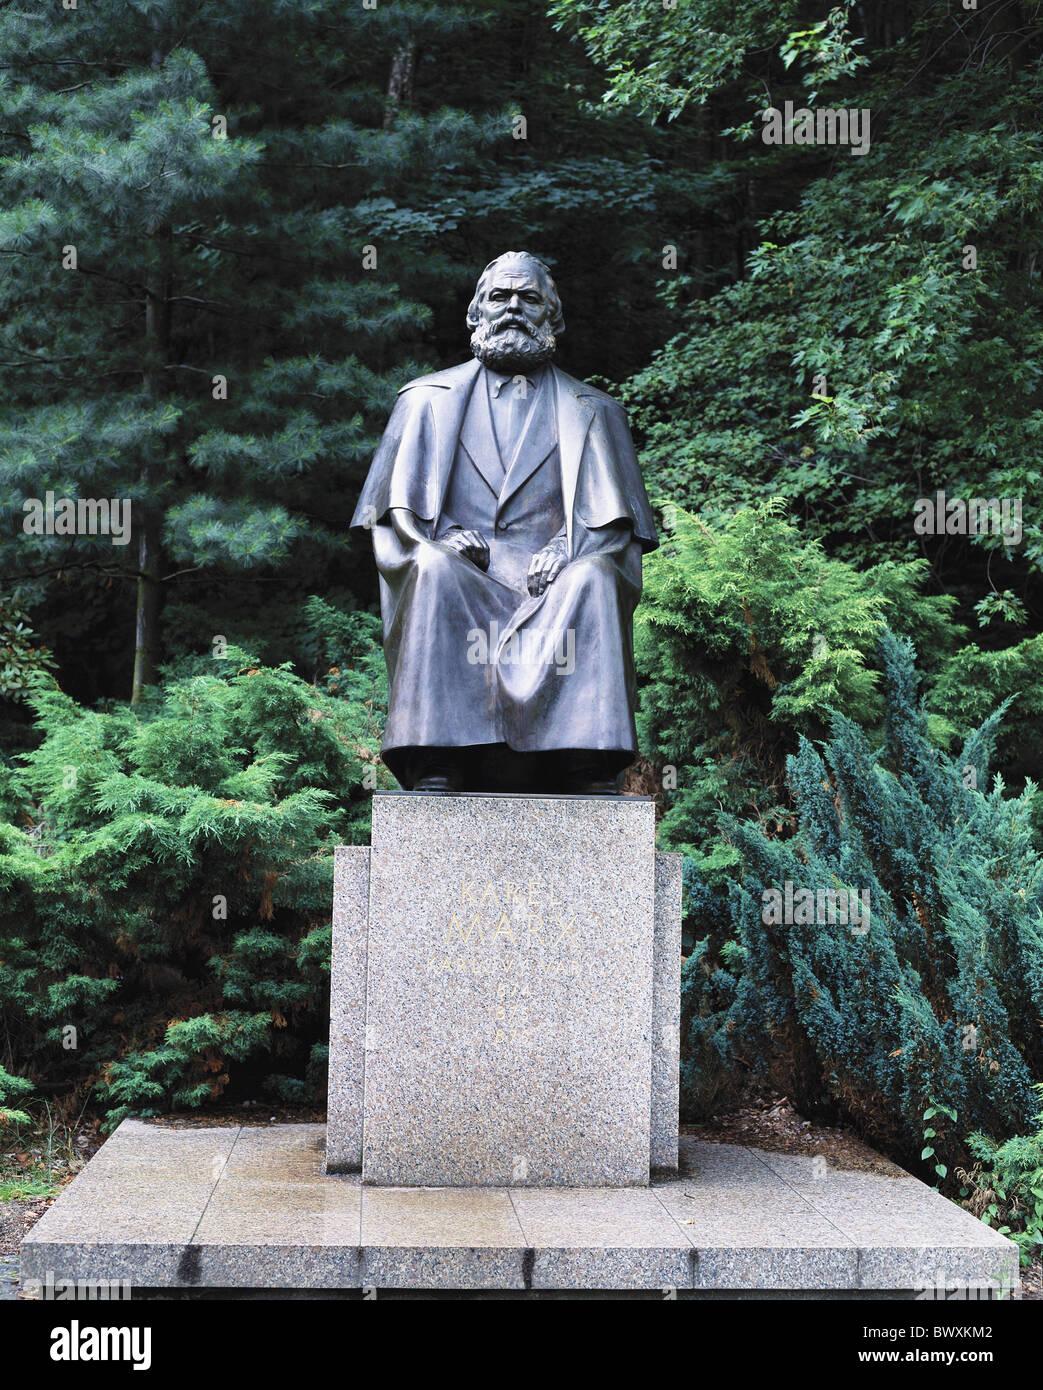 trees bronze monument Karlovy Vary Marx sculpture base Czechia Europe - Stock Image